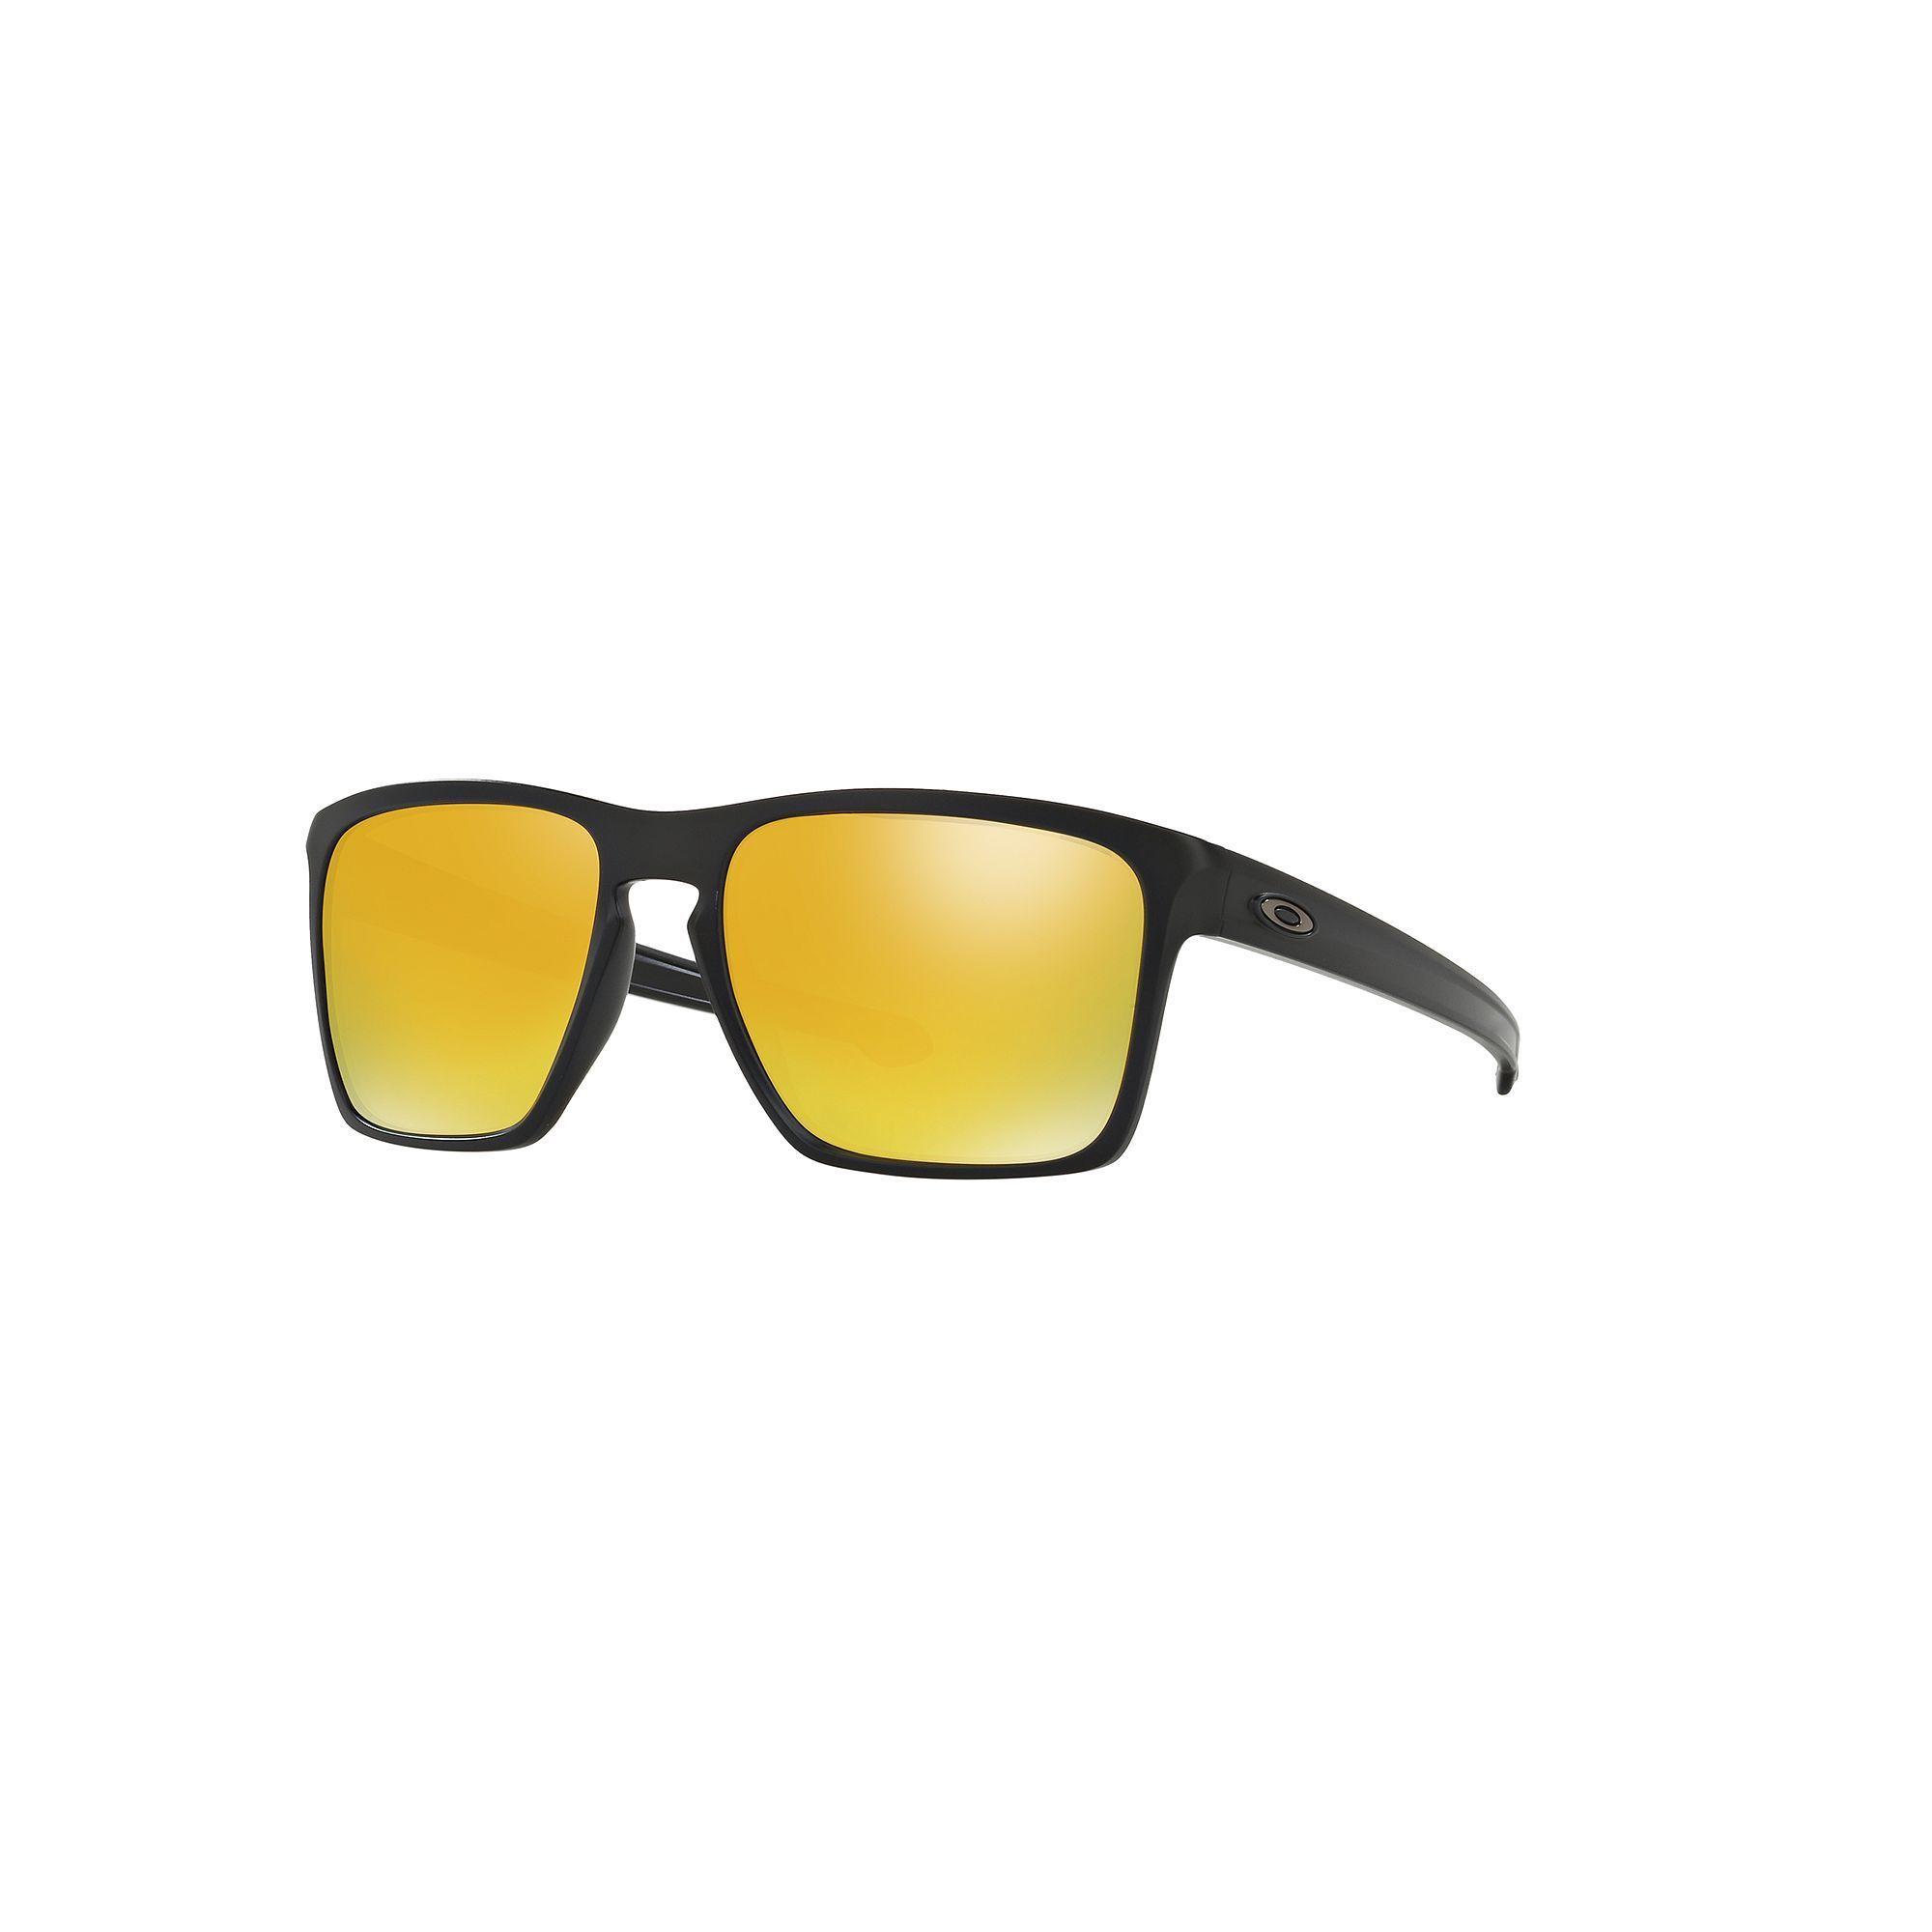 8fba854c53 Oakley Sliver XL OO9341 57mm Square Sunglasses